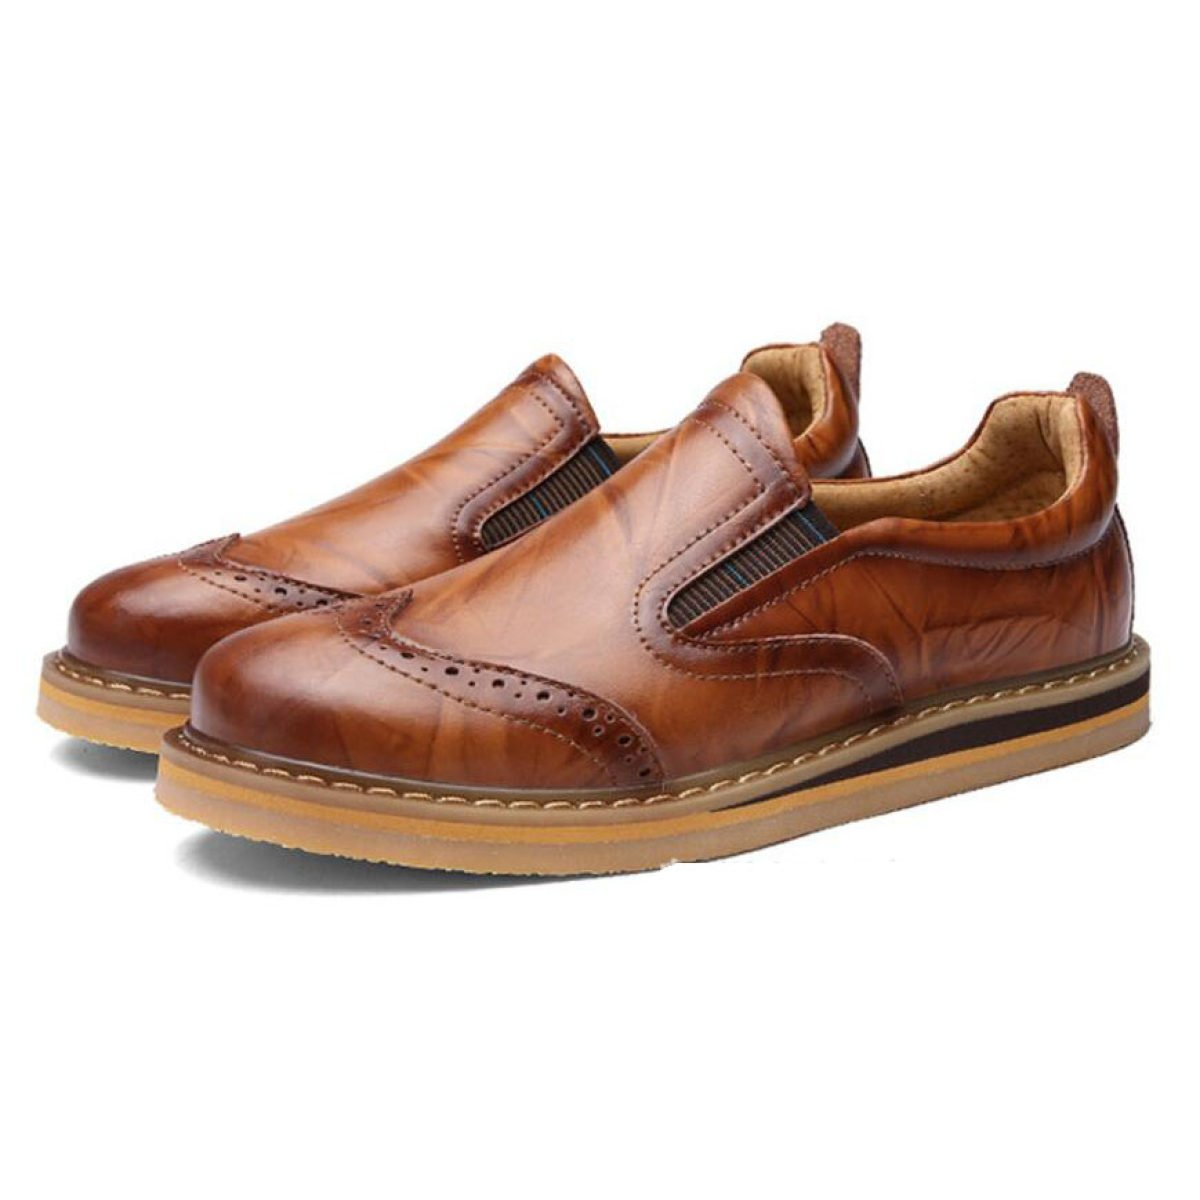 Herrenschuhe Geschnitzte Schuhe Schuhe Leder Männer Freizeitschuhe Niedrige Schuhe Schuhe Zu Helfen Schuhe Braun c2eca7